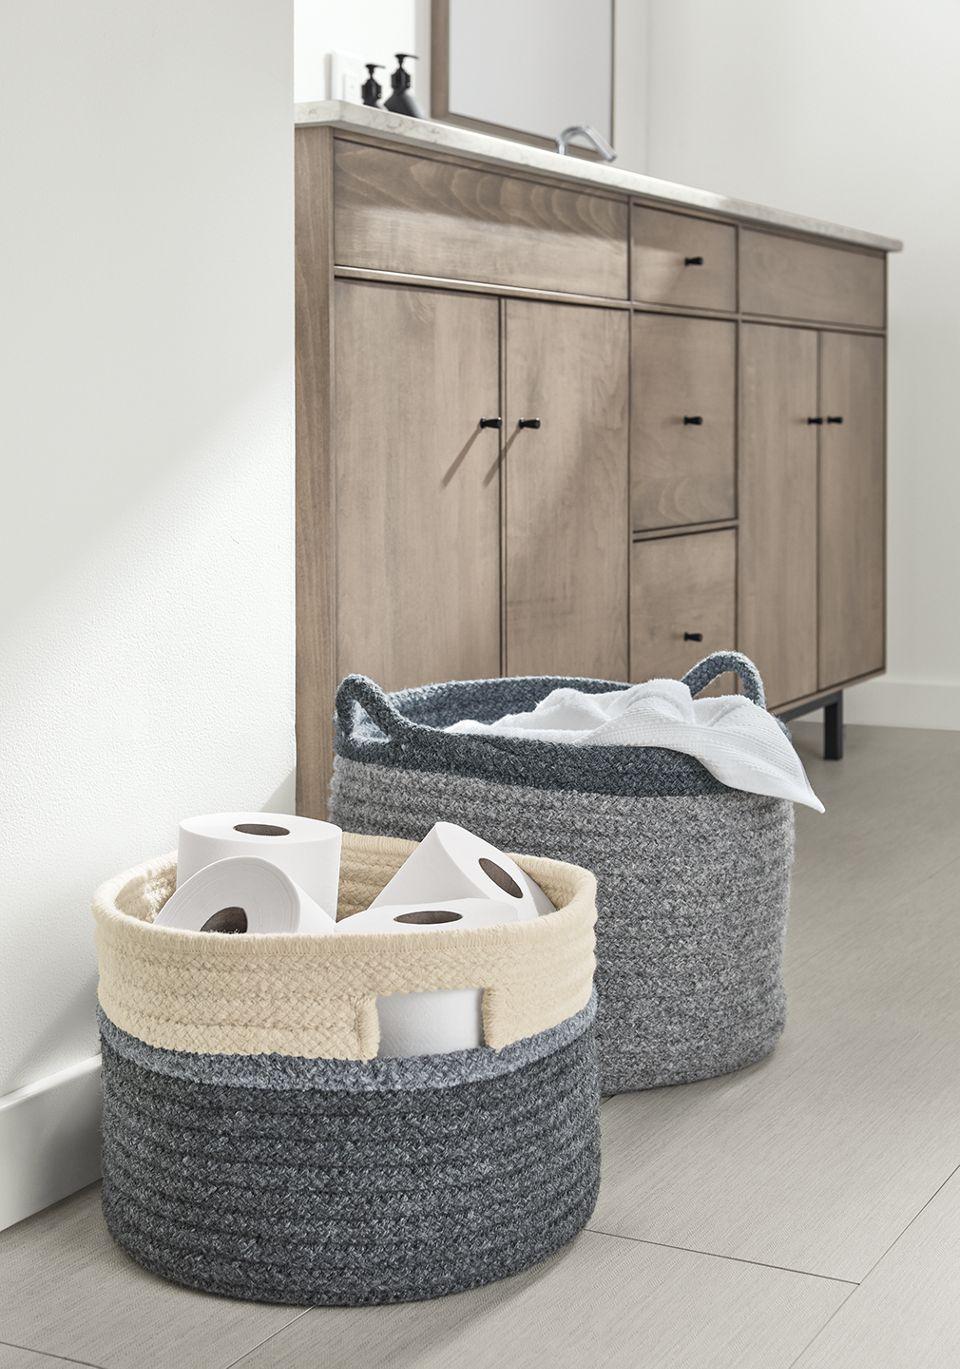 Detail of Kori decorative storage bins